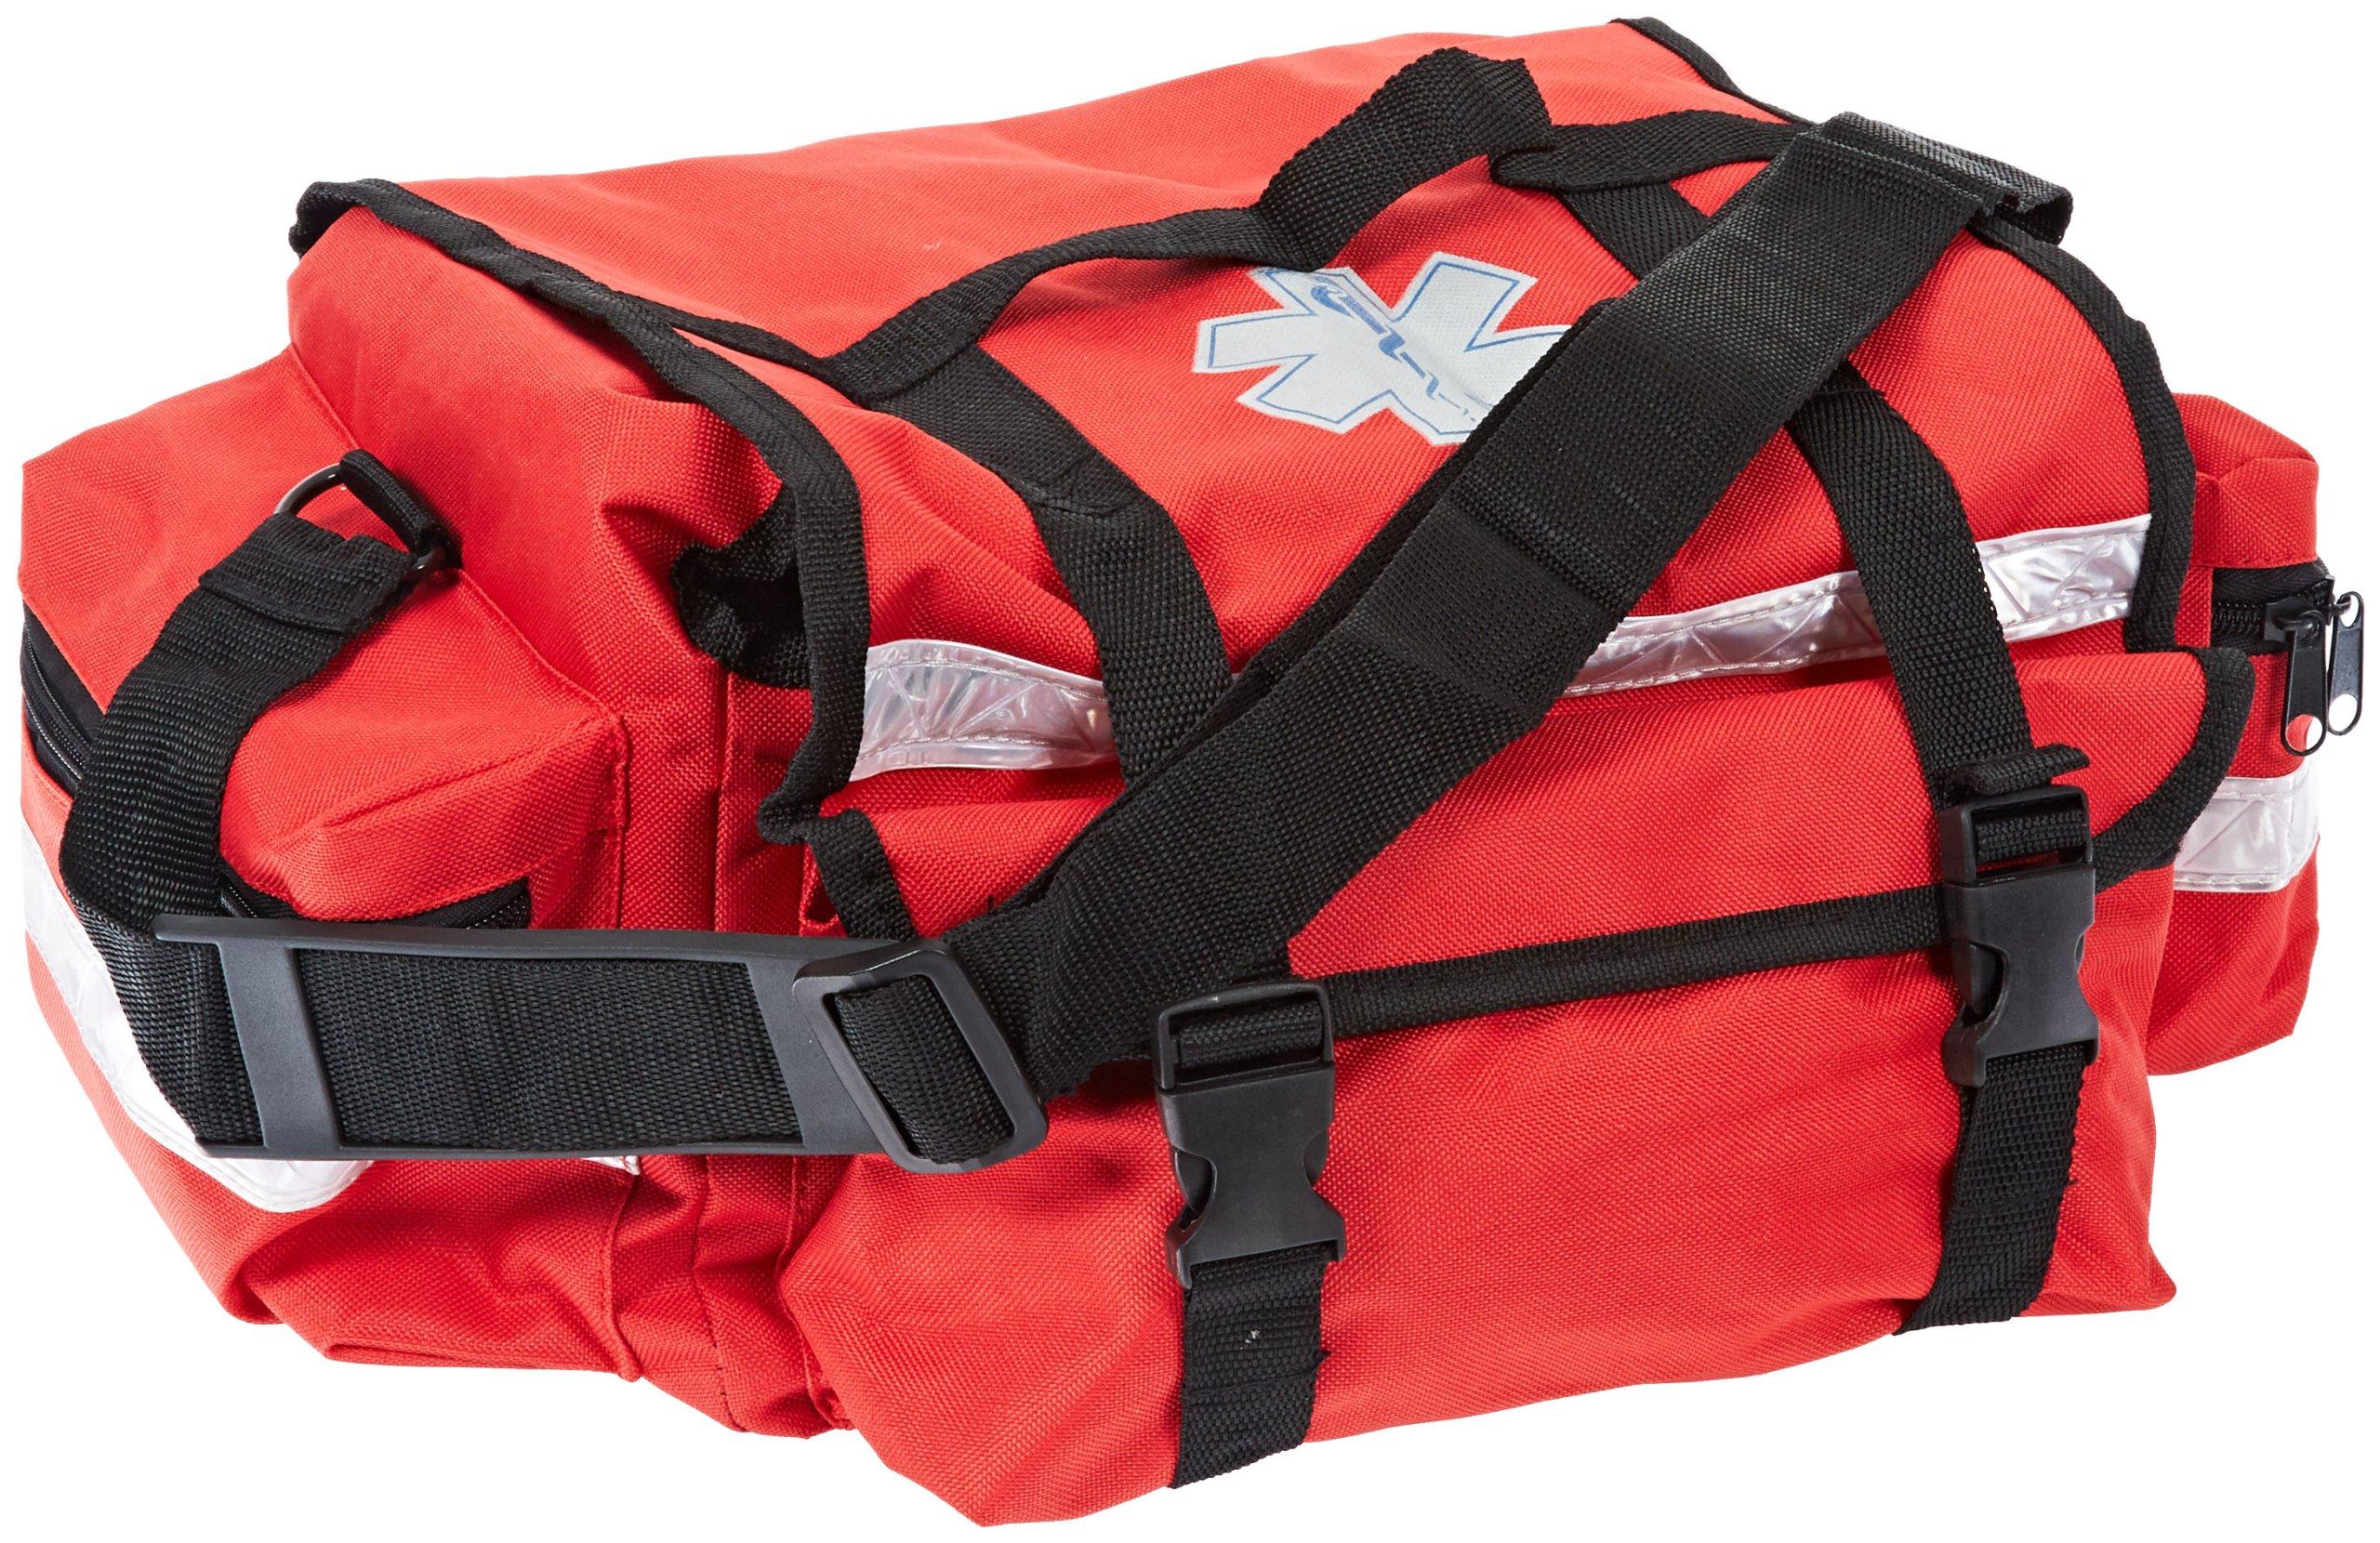 Primacare KB-RO74-R Trauma Bag, 7'' Height x 17'' Width x 9'' Depth, Red